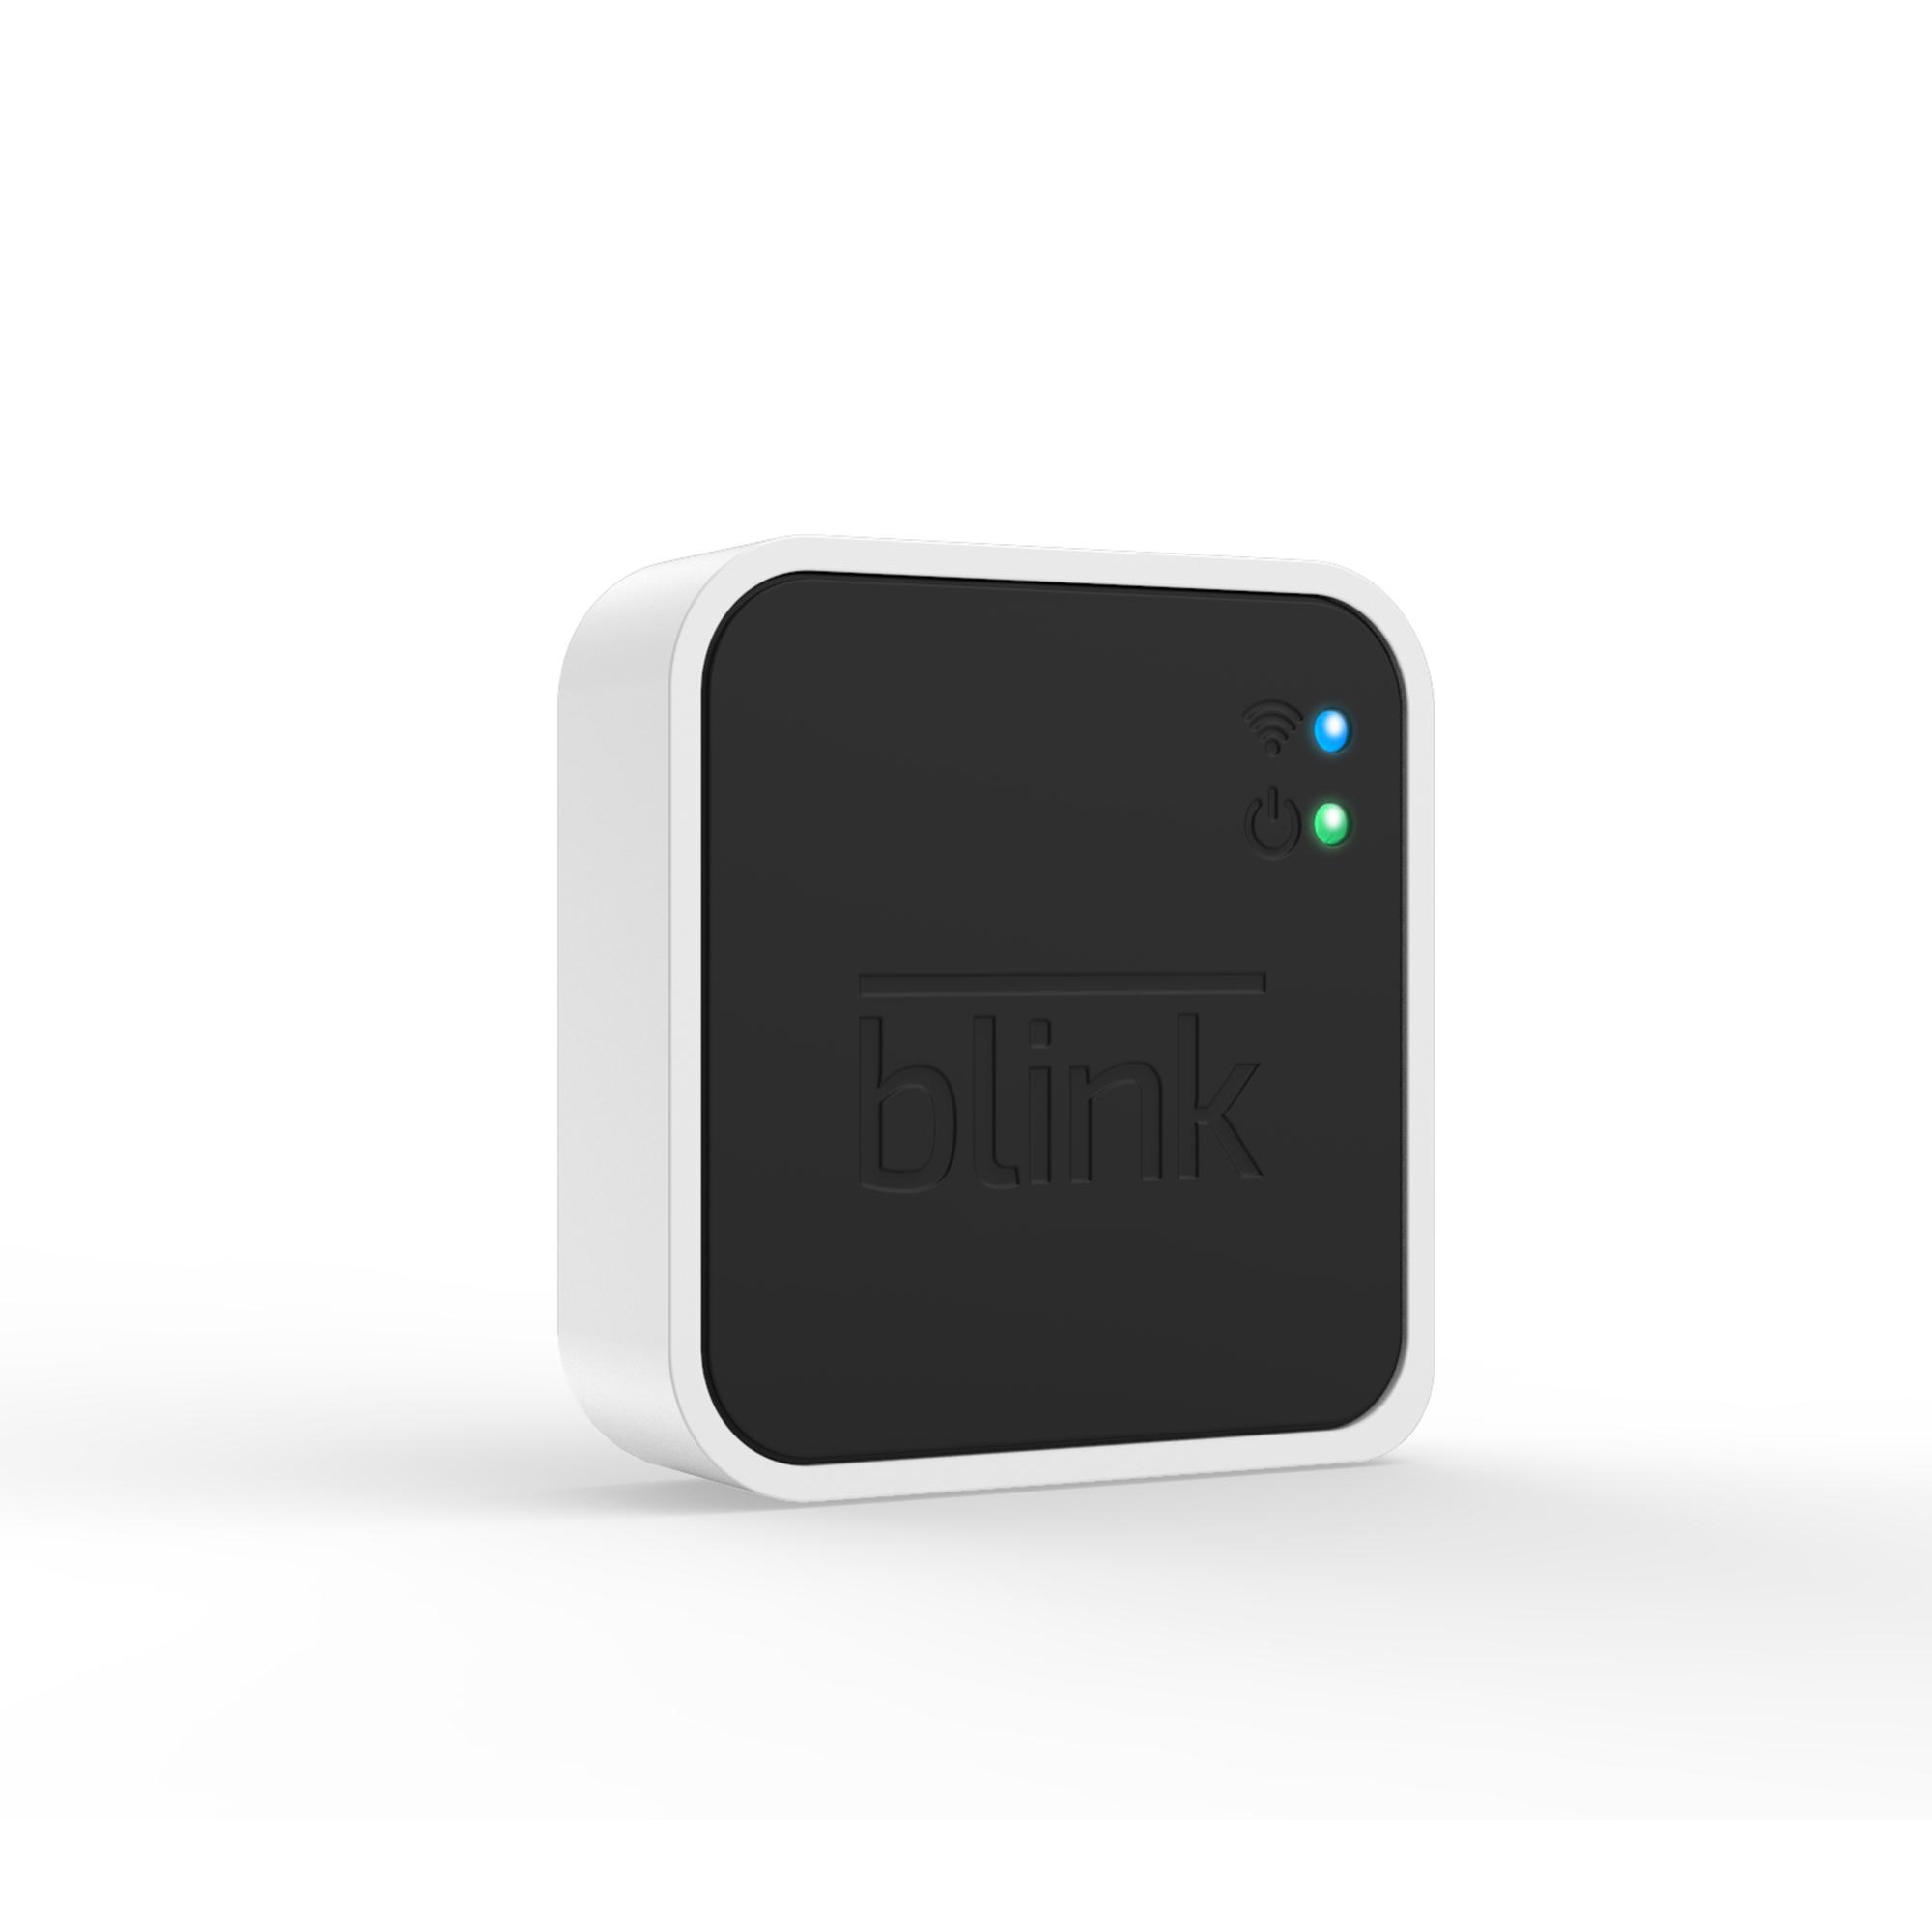 Blink Sync Module 2 - Image 2